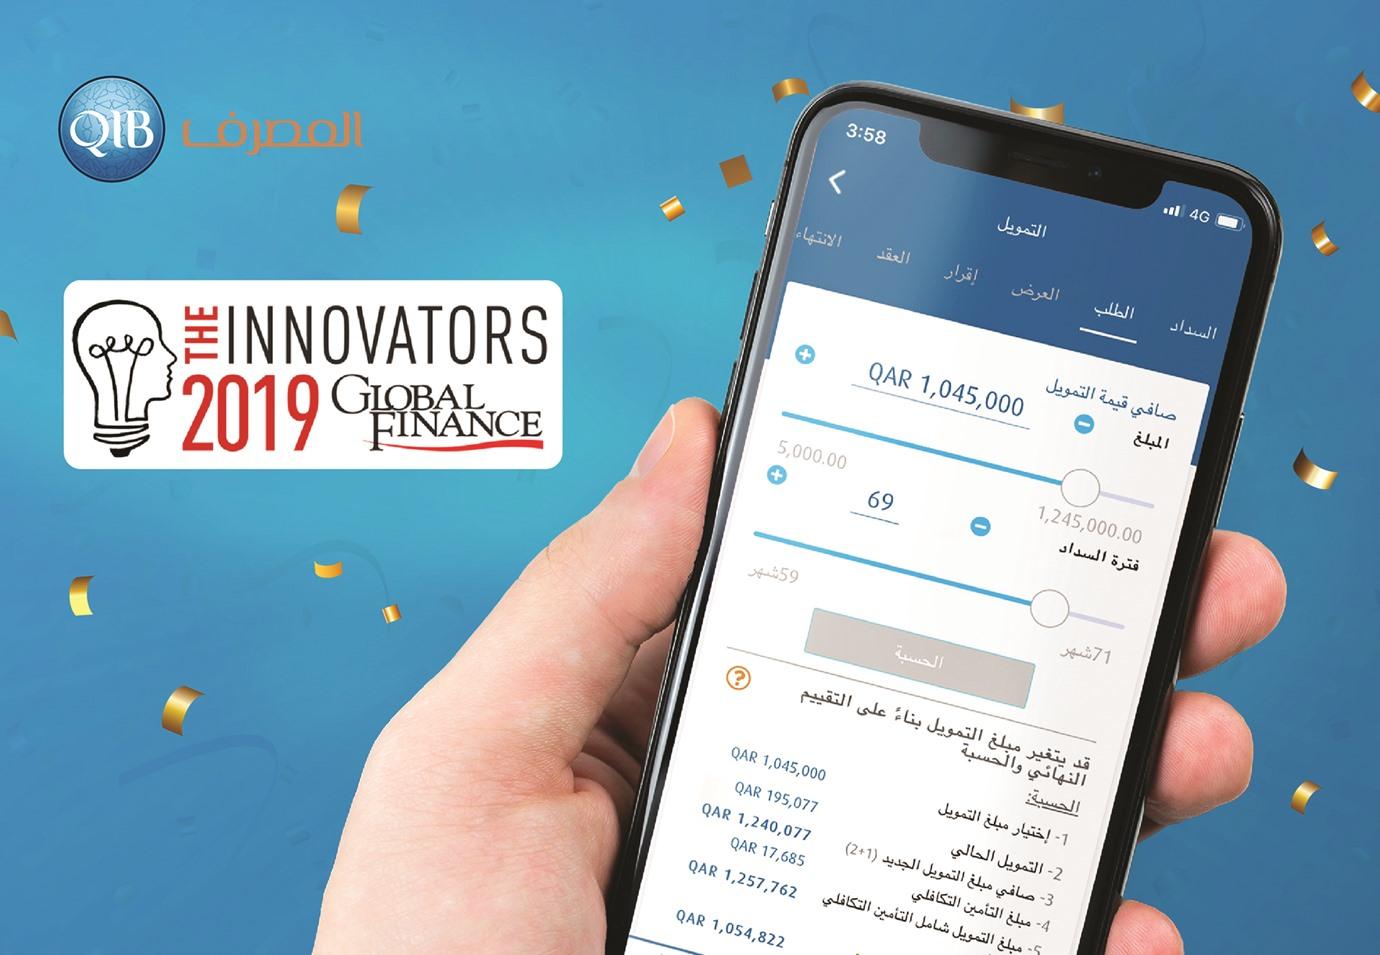 QIB awarded 'Islamic Finance Innovator 2019' by Global Finance